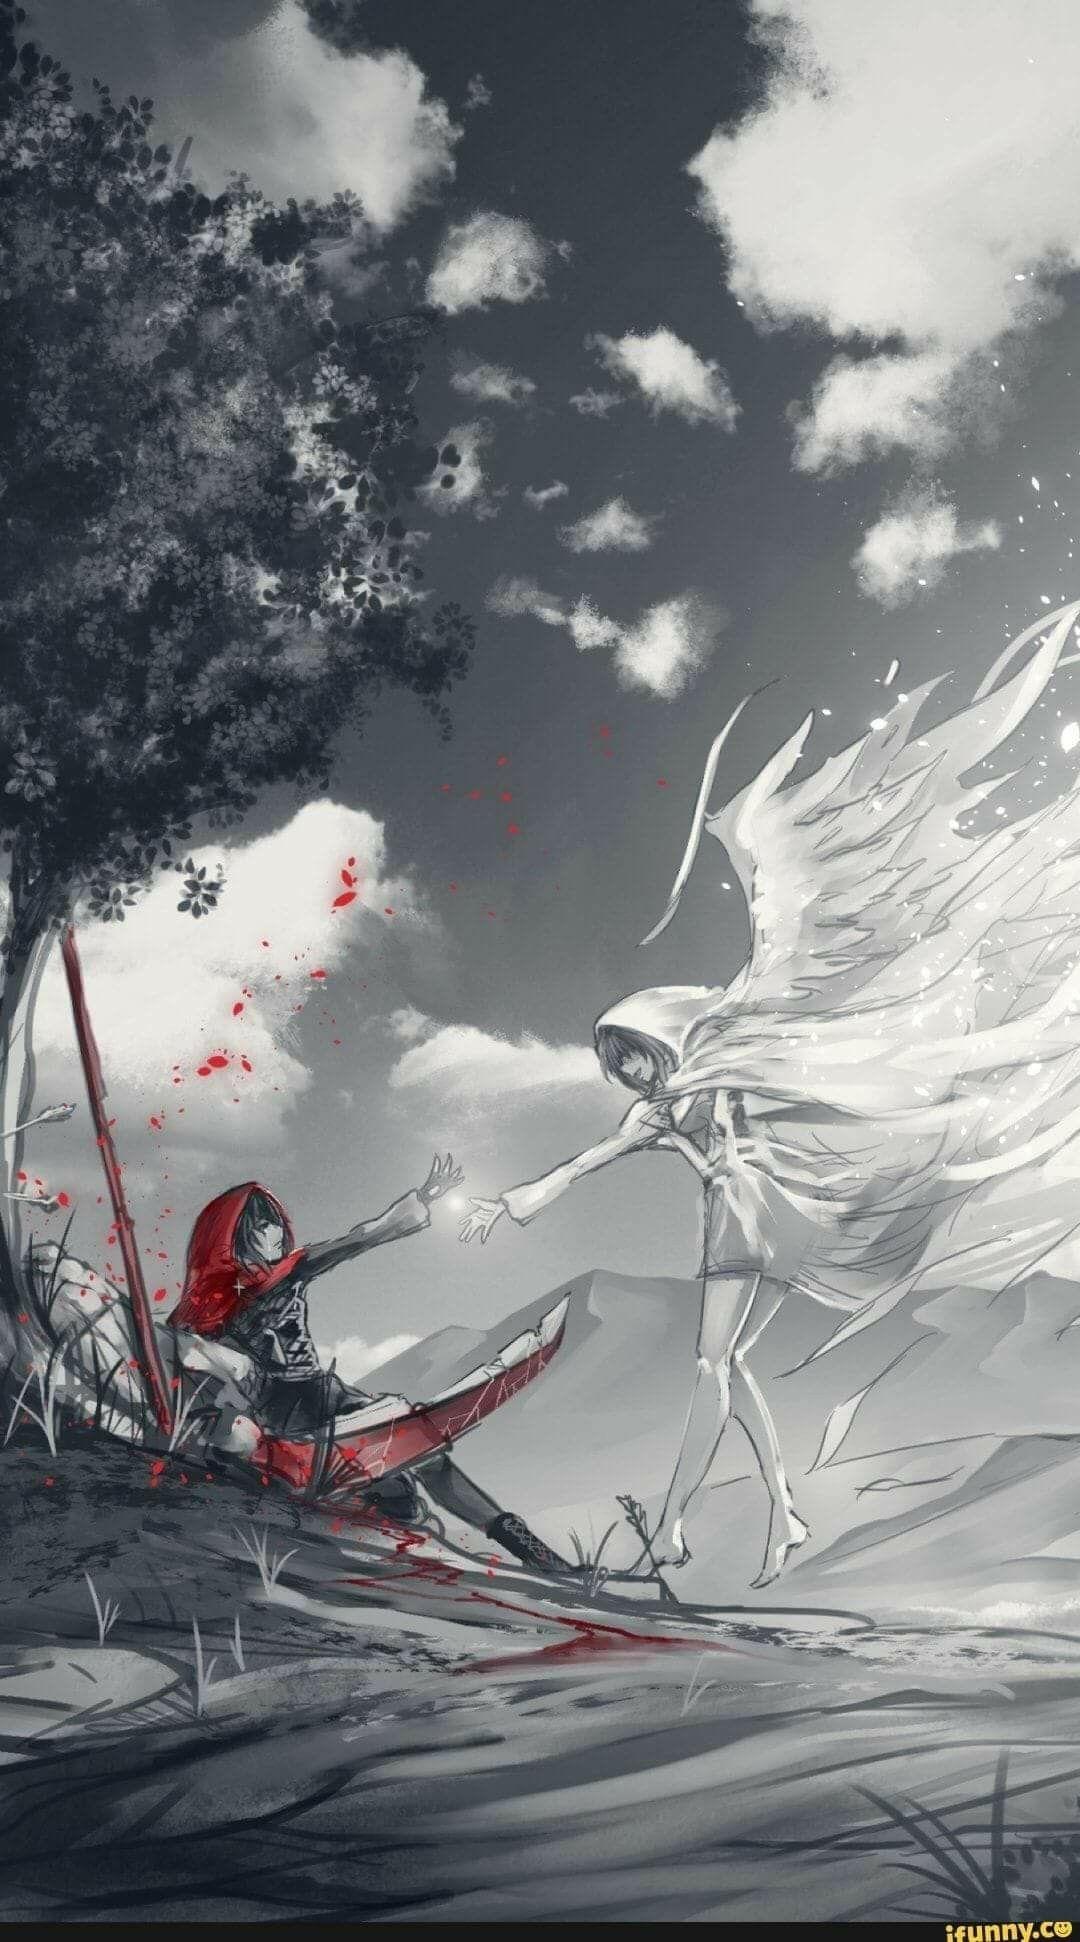 RWBY RubyRose SummerRose Rwby anime, Rwby wallpaper